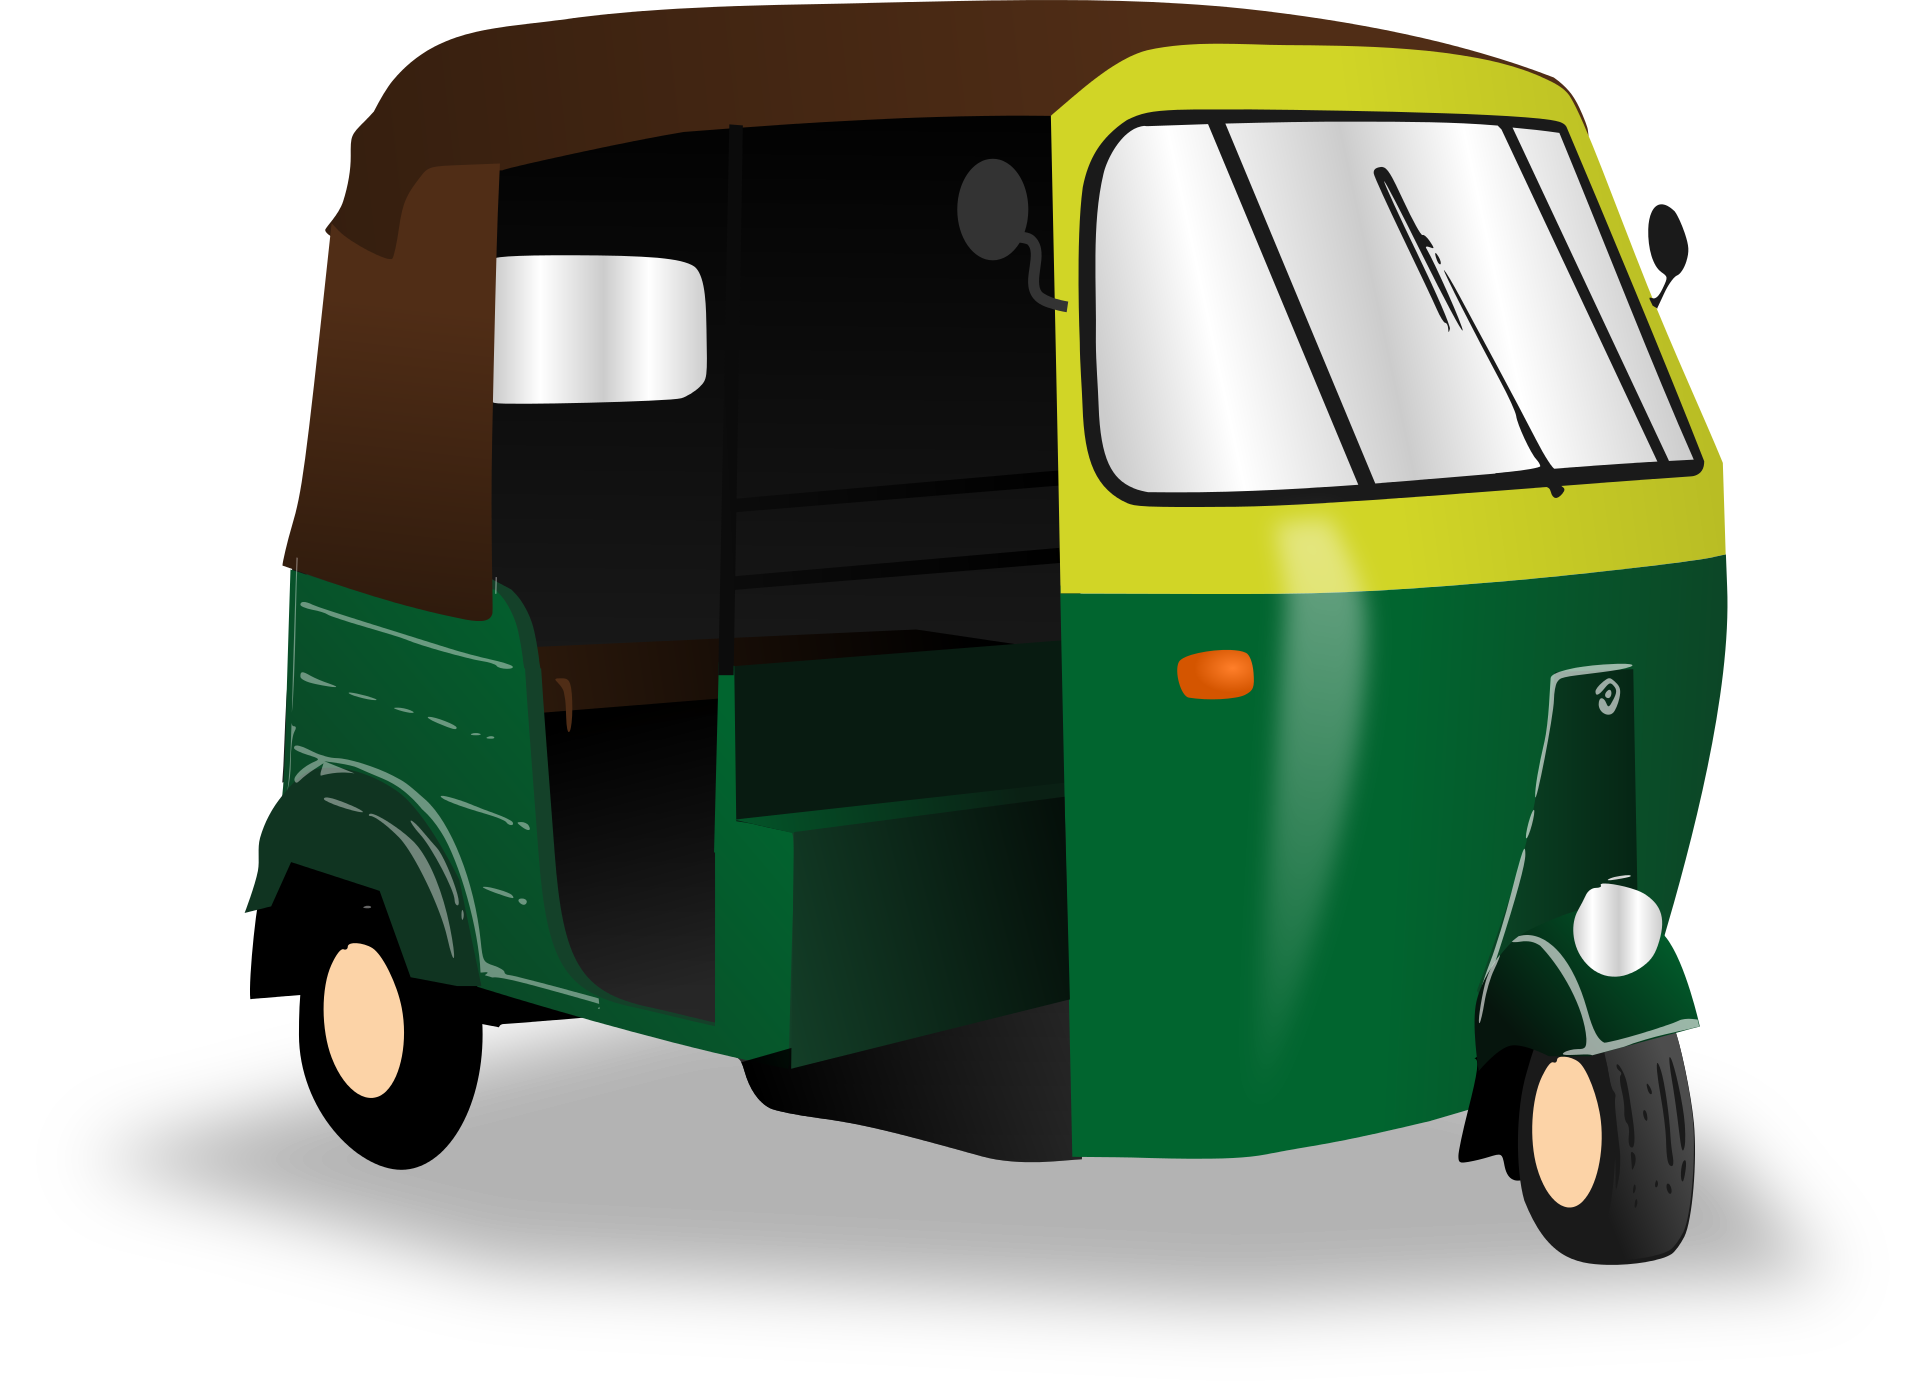 Auto Rickshaw PNG Images Transparent Free Download.